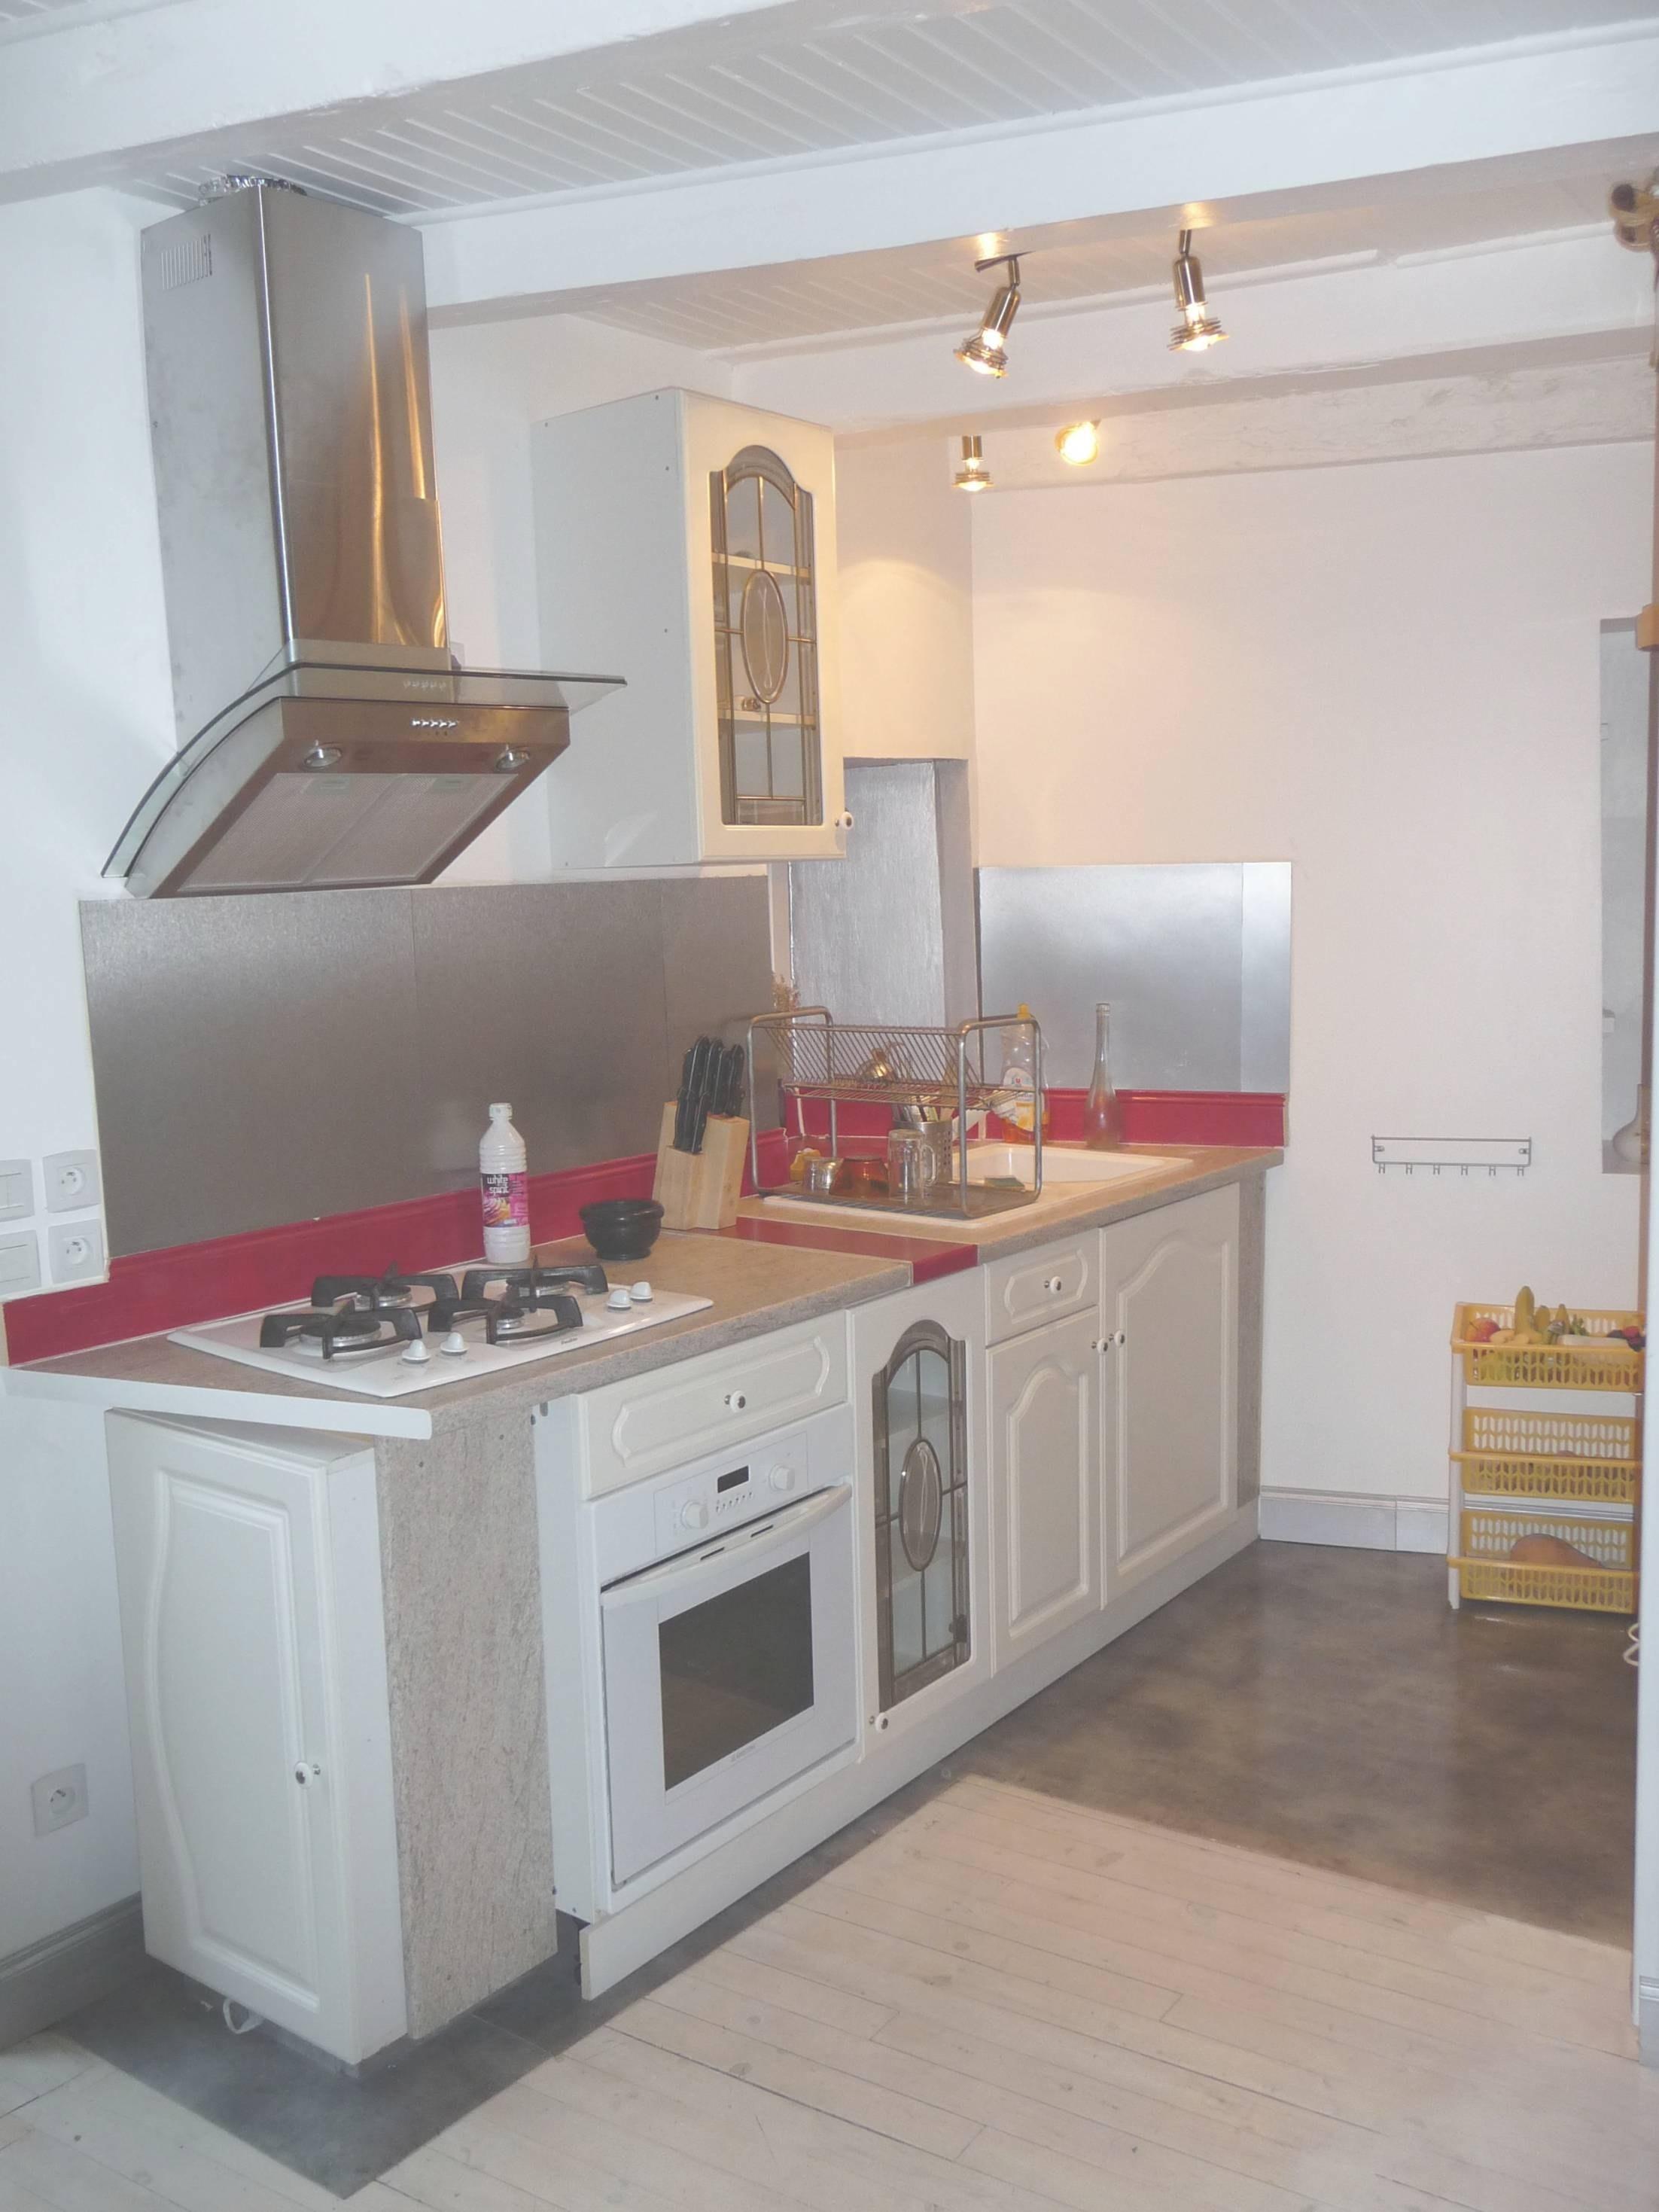 Modele Cuisine Vogica Atwebsterfr Maison Et Mobilier - Vogica cuisine